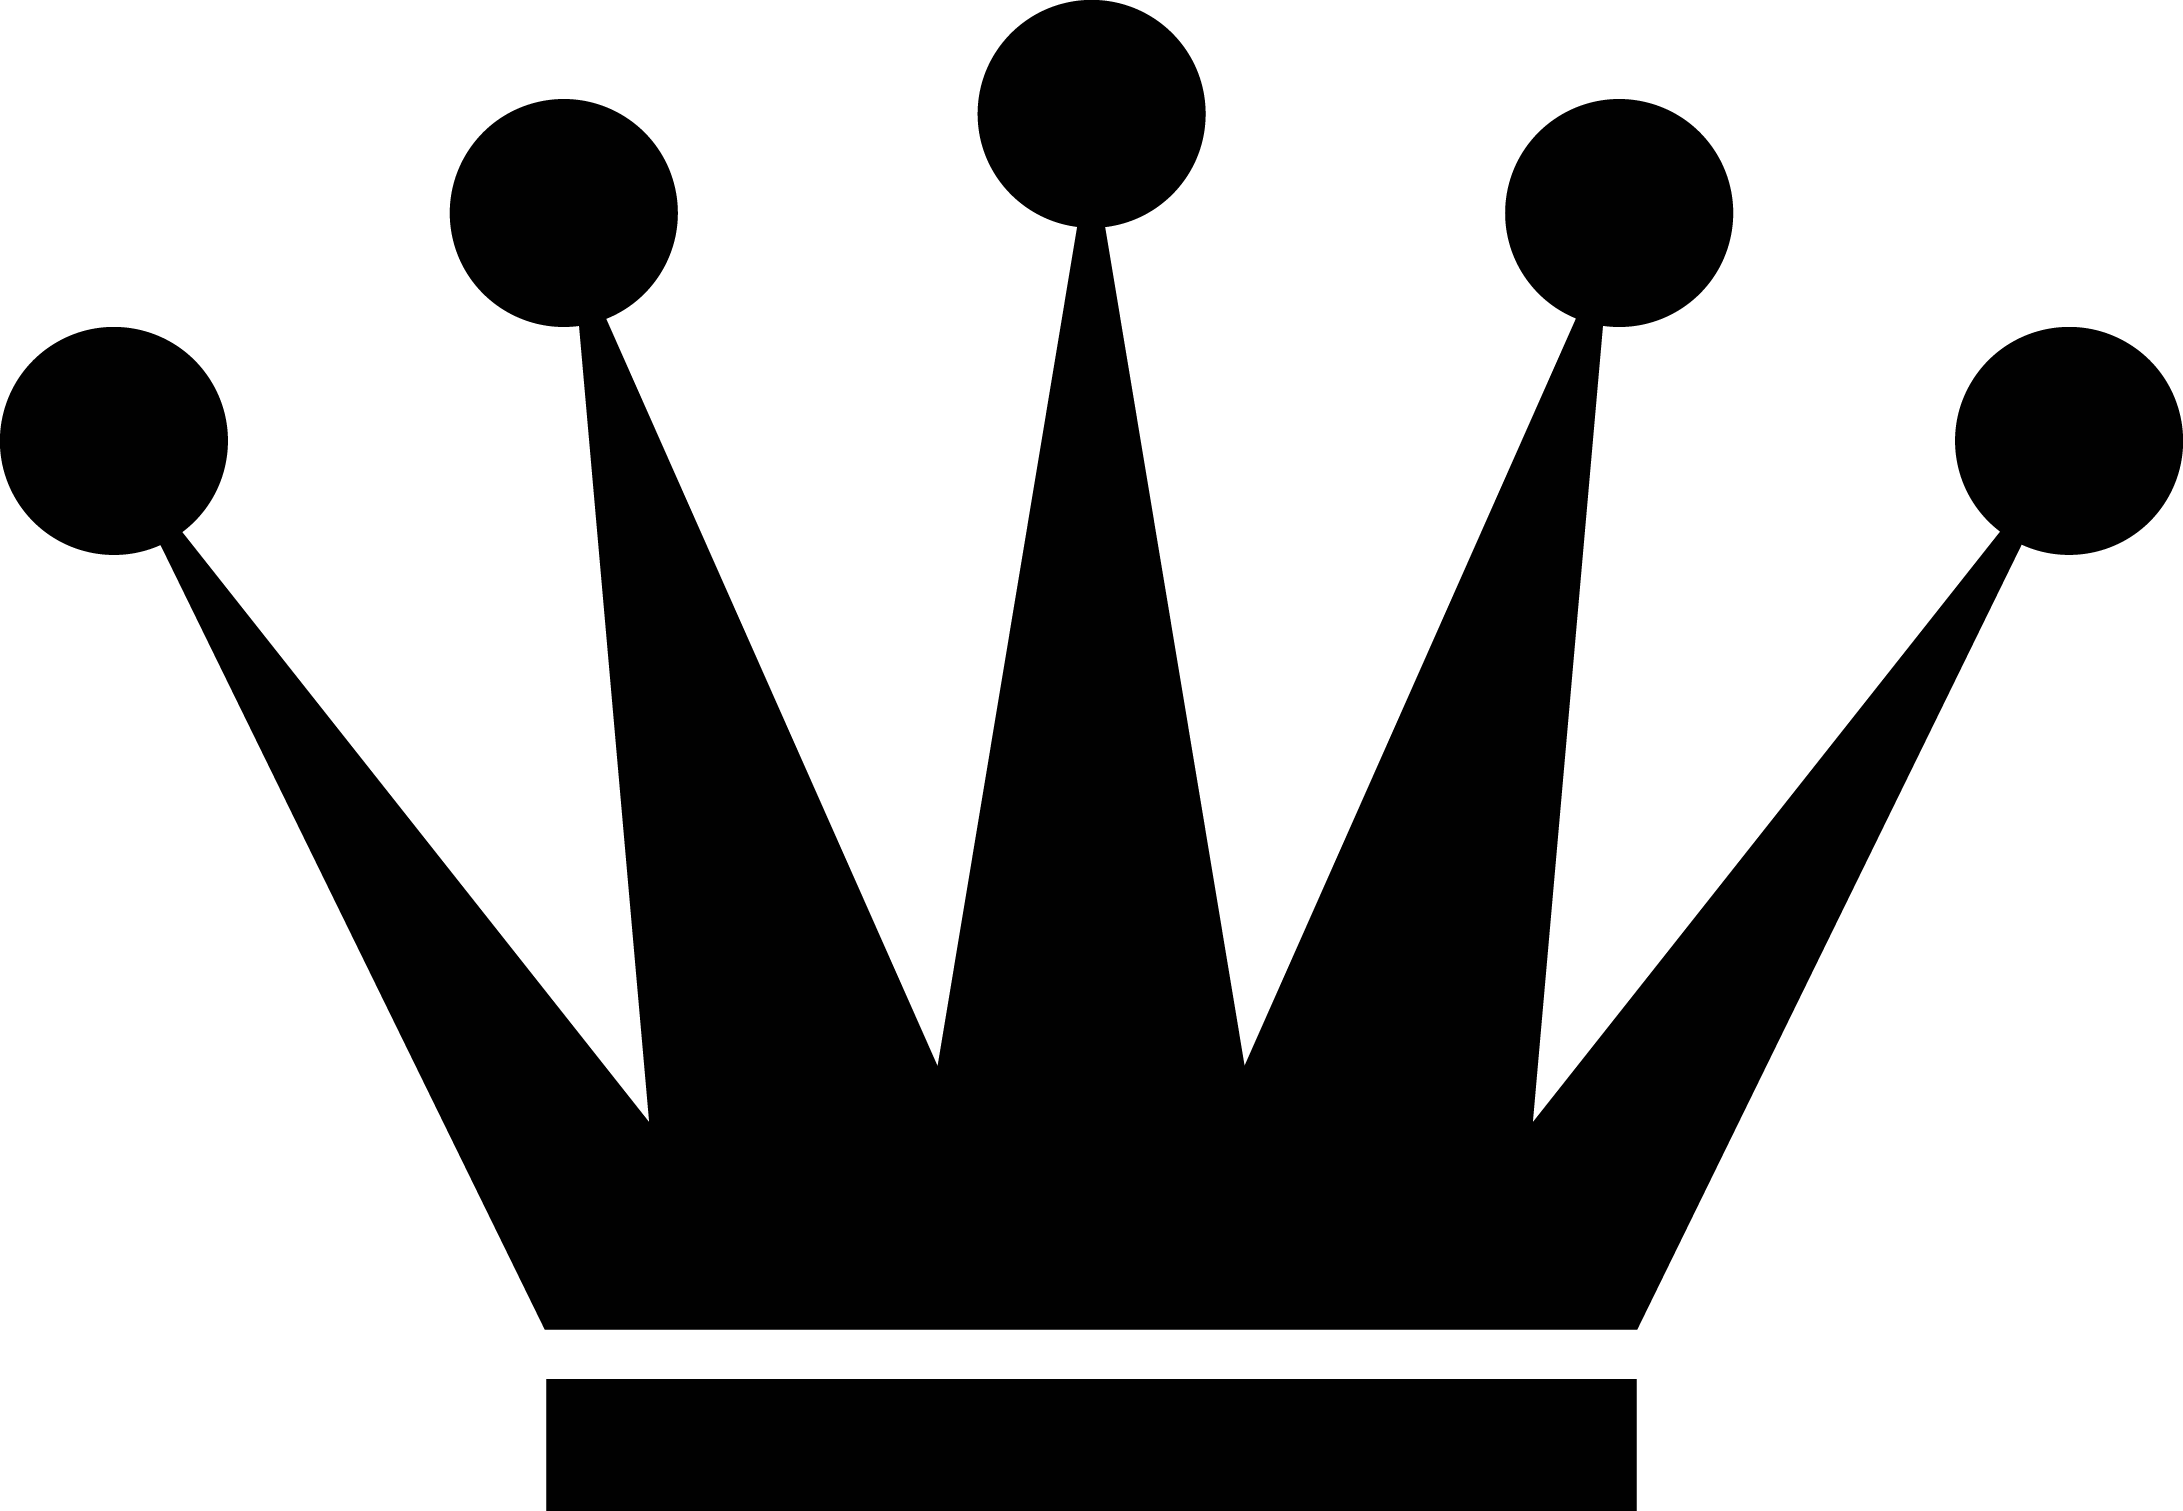 King Crown Logo Png - King Crown Png Black Clipart - Full ...